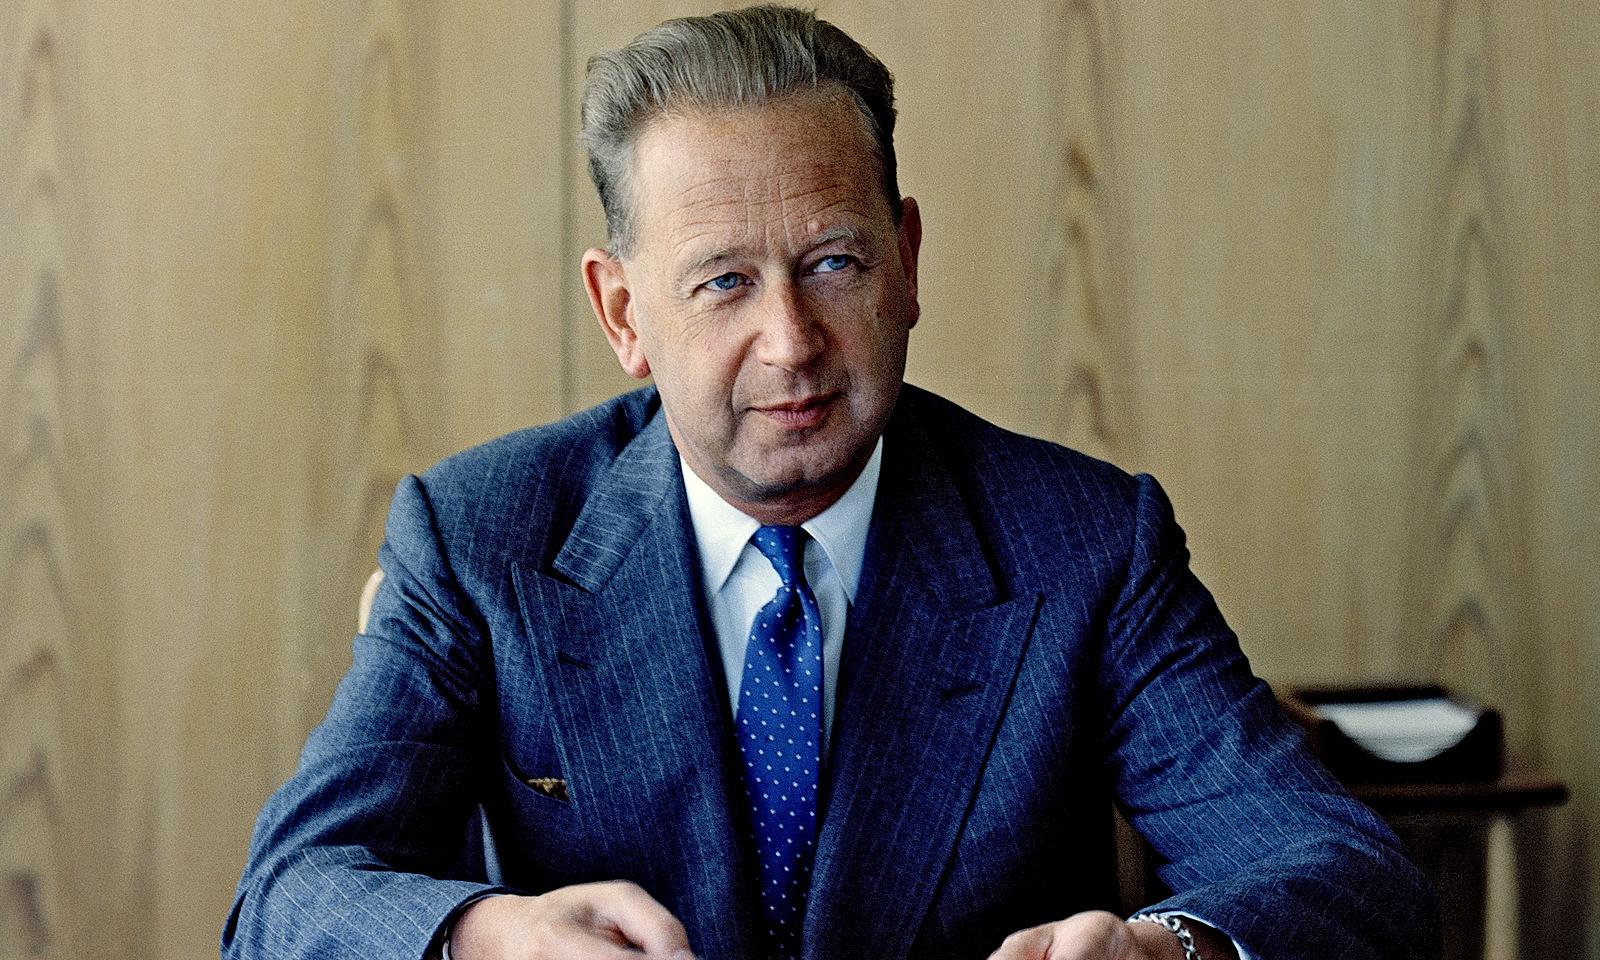 UN Investigating Suspicious Death Of Former UN Head, Allegedly Killed By CIA